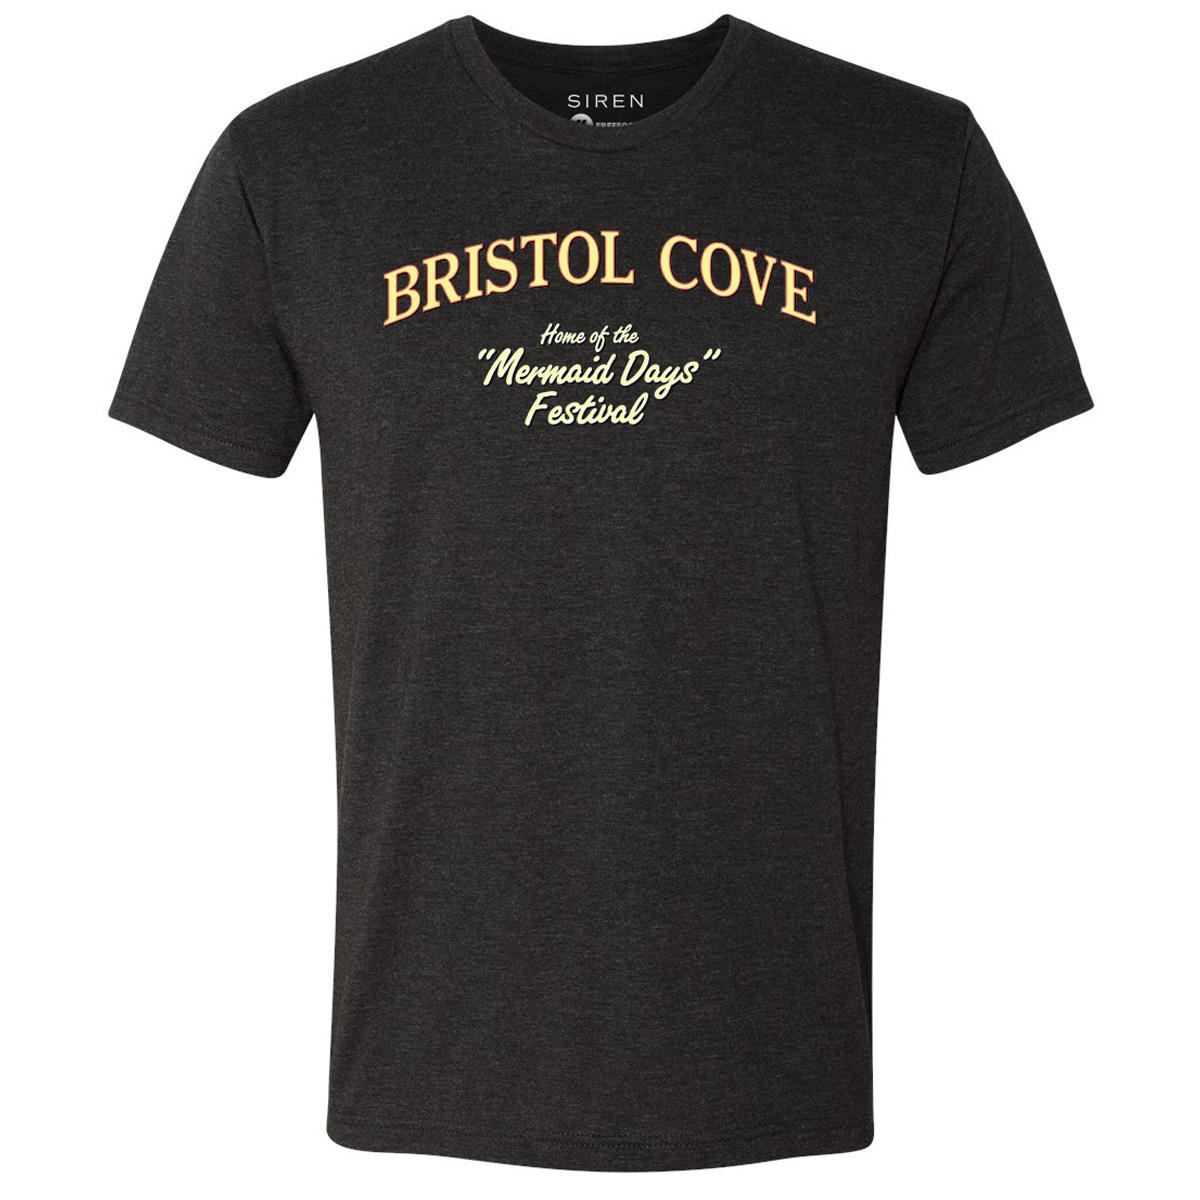 Siren Bristol Cove T-Shirt